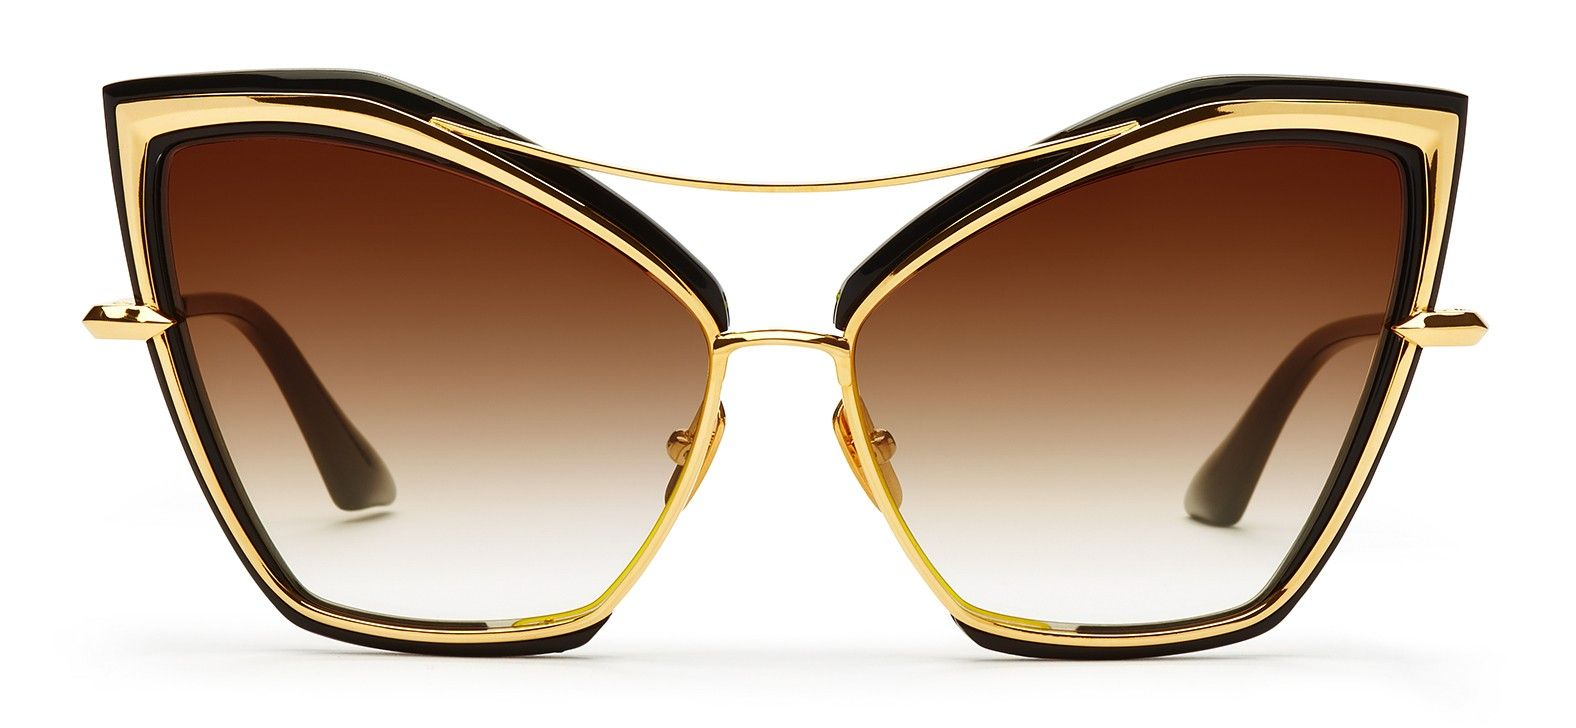 the creature sunglasses by dita eyewear - Dita Frames